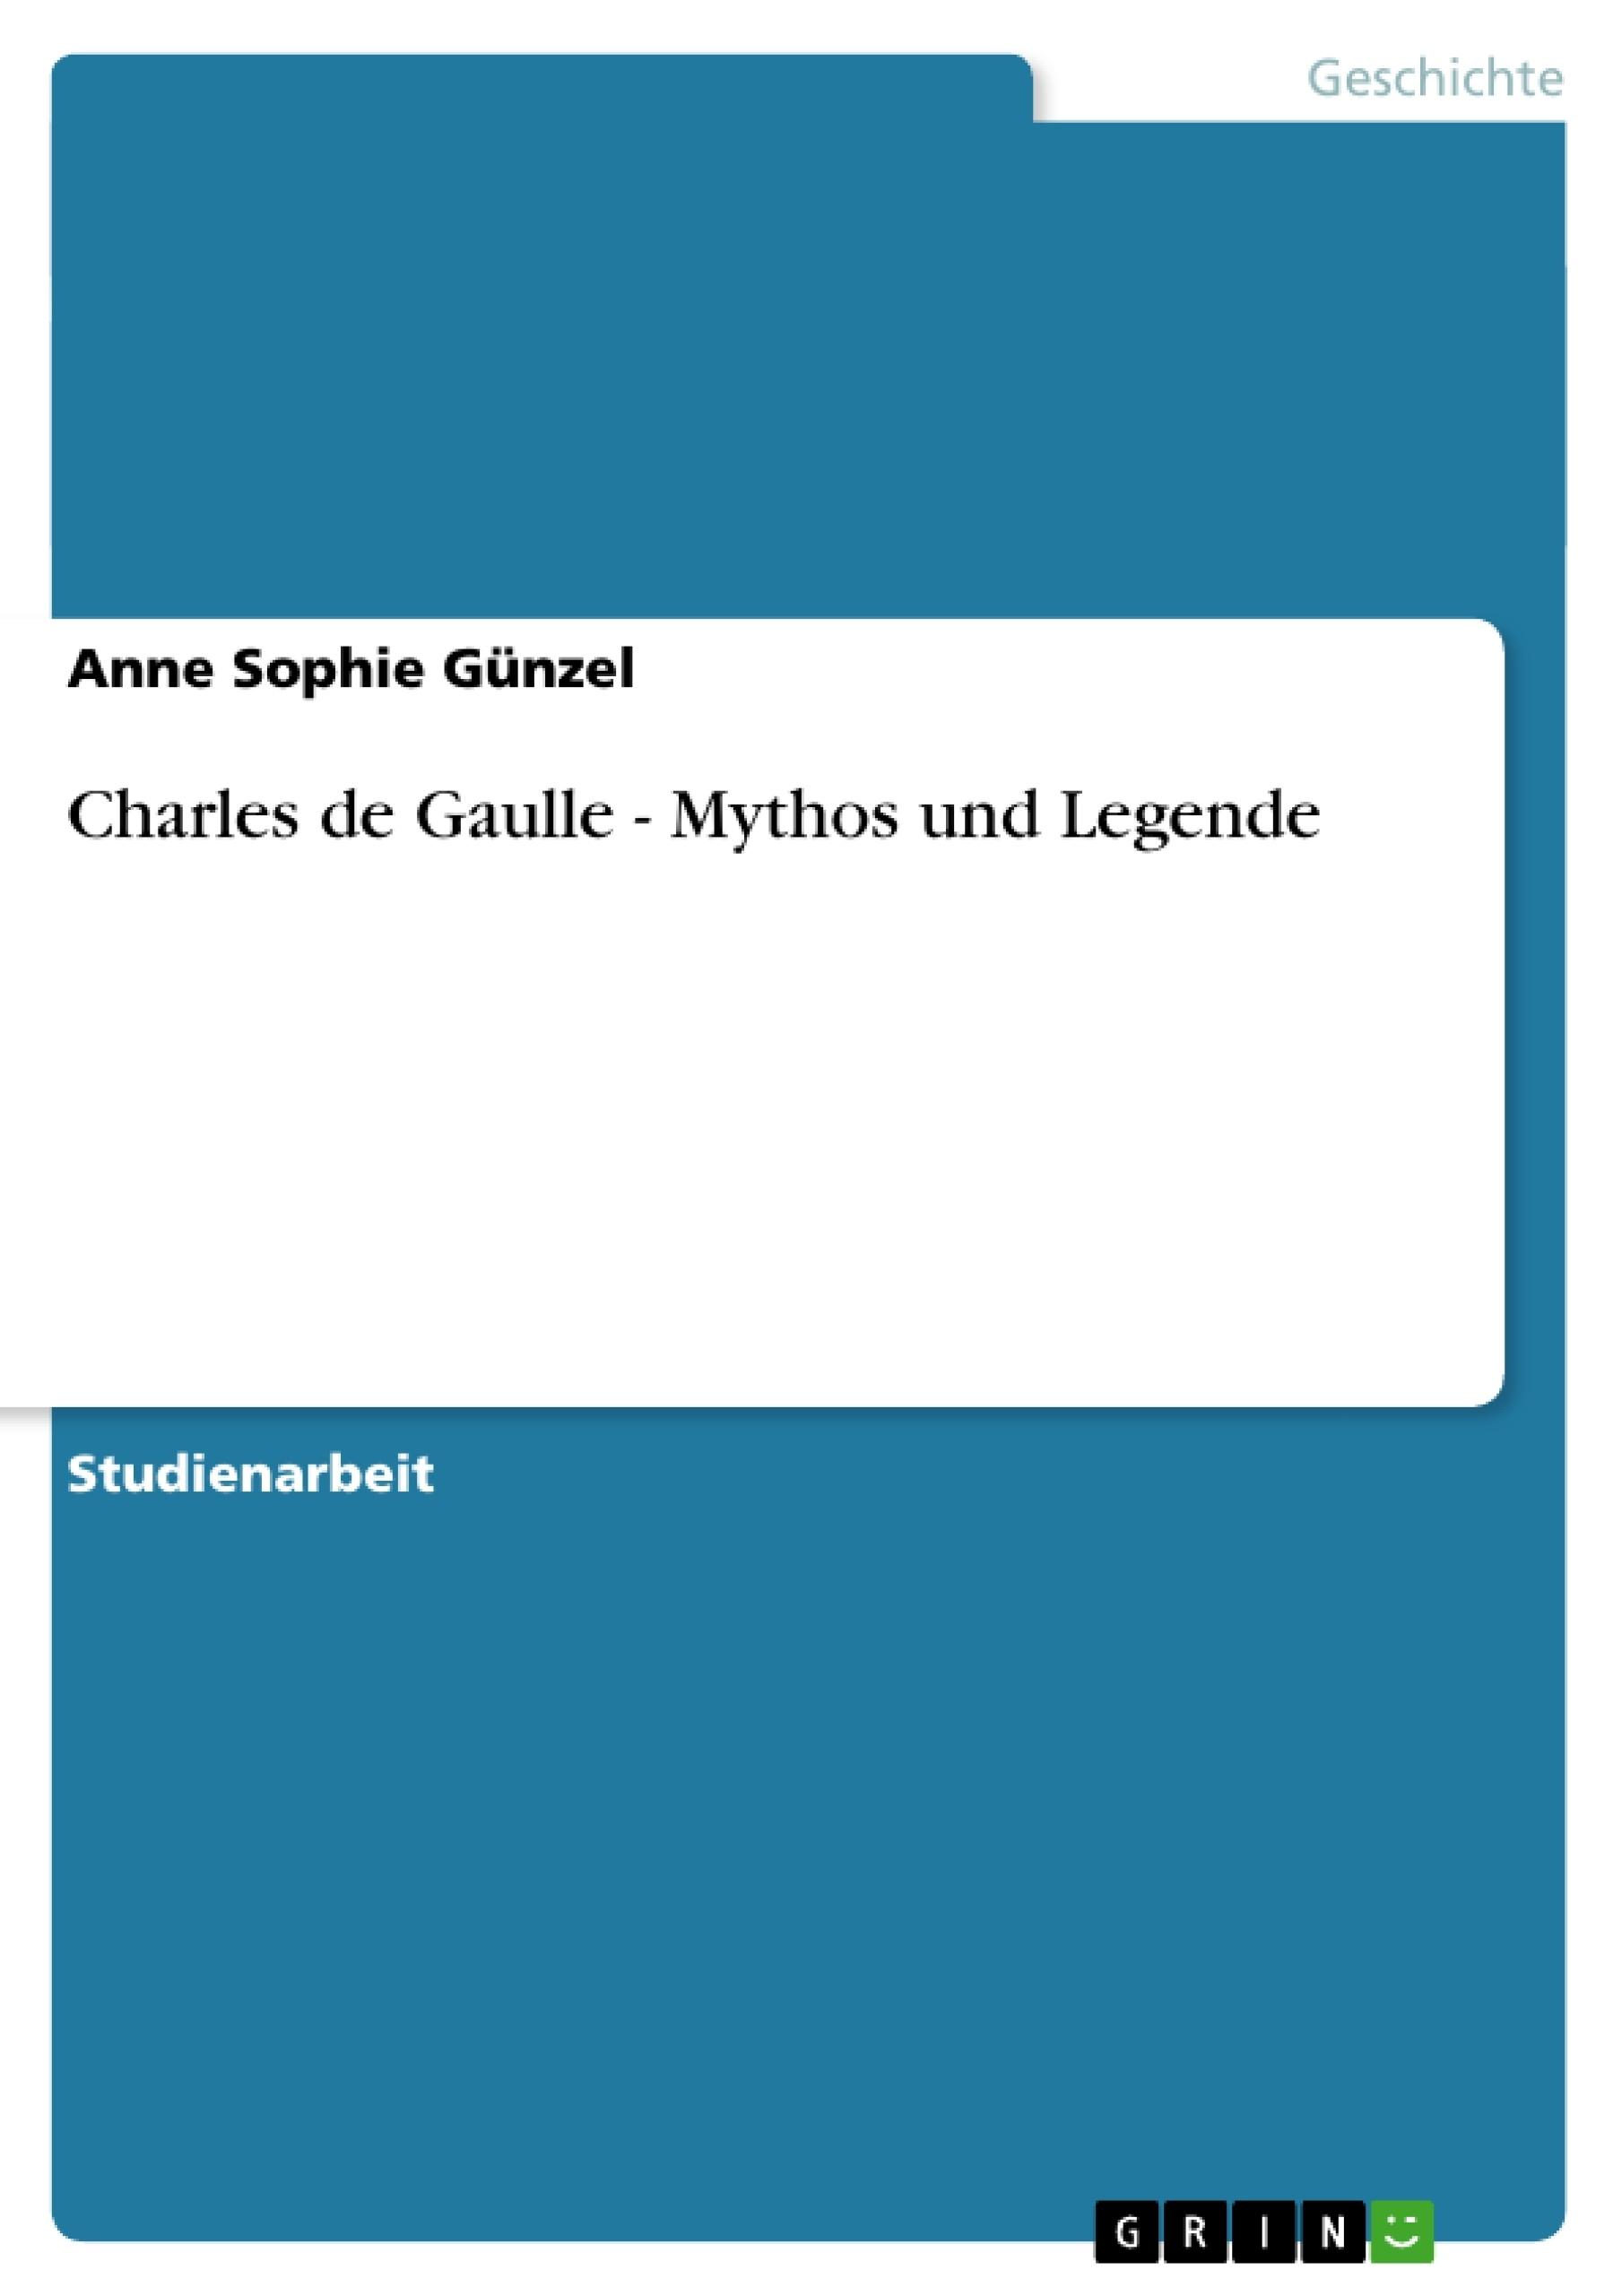 Titel: Charles de Gaulle - Mythos und Legende